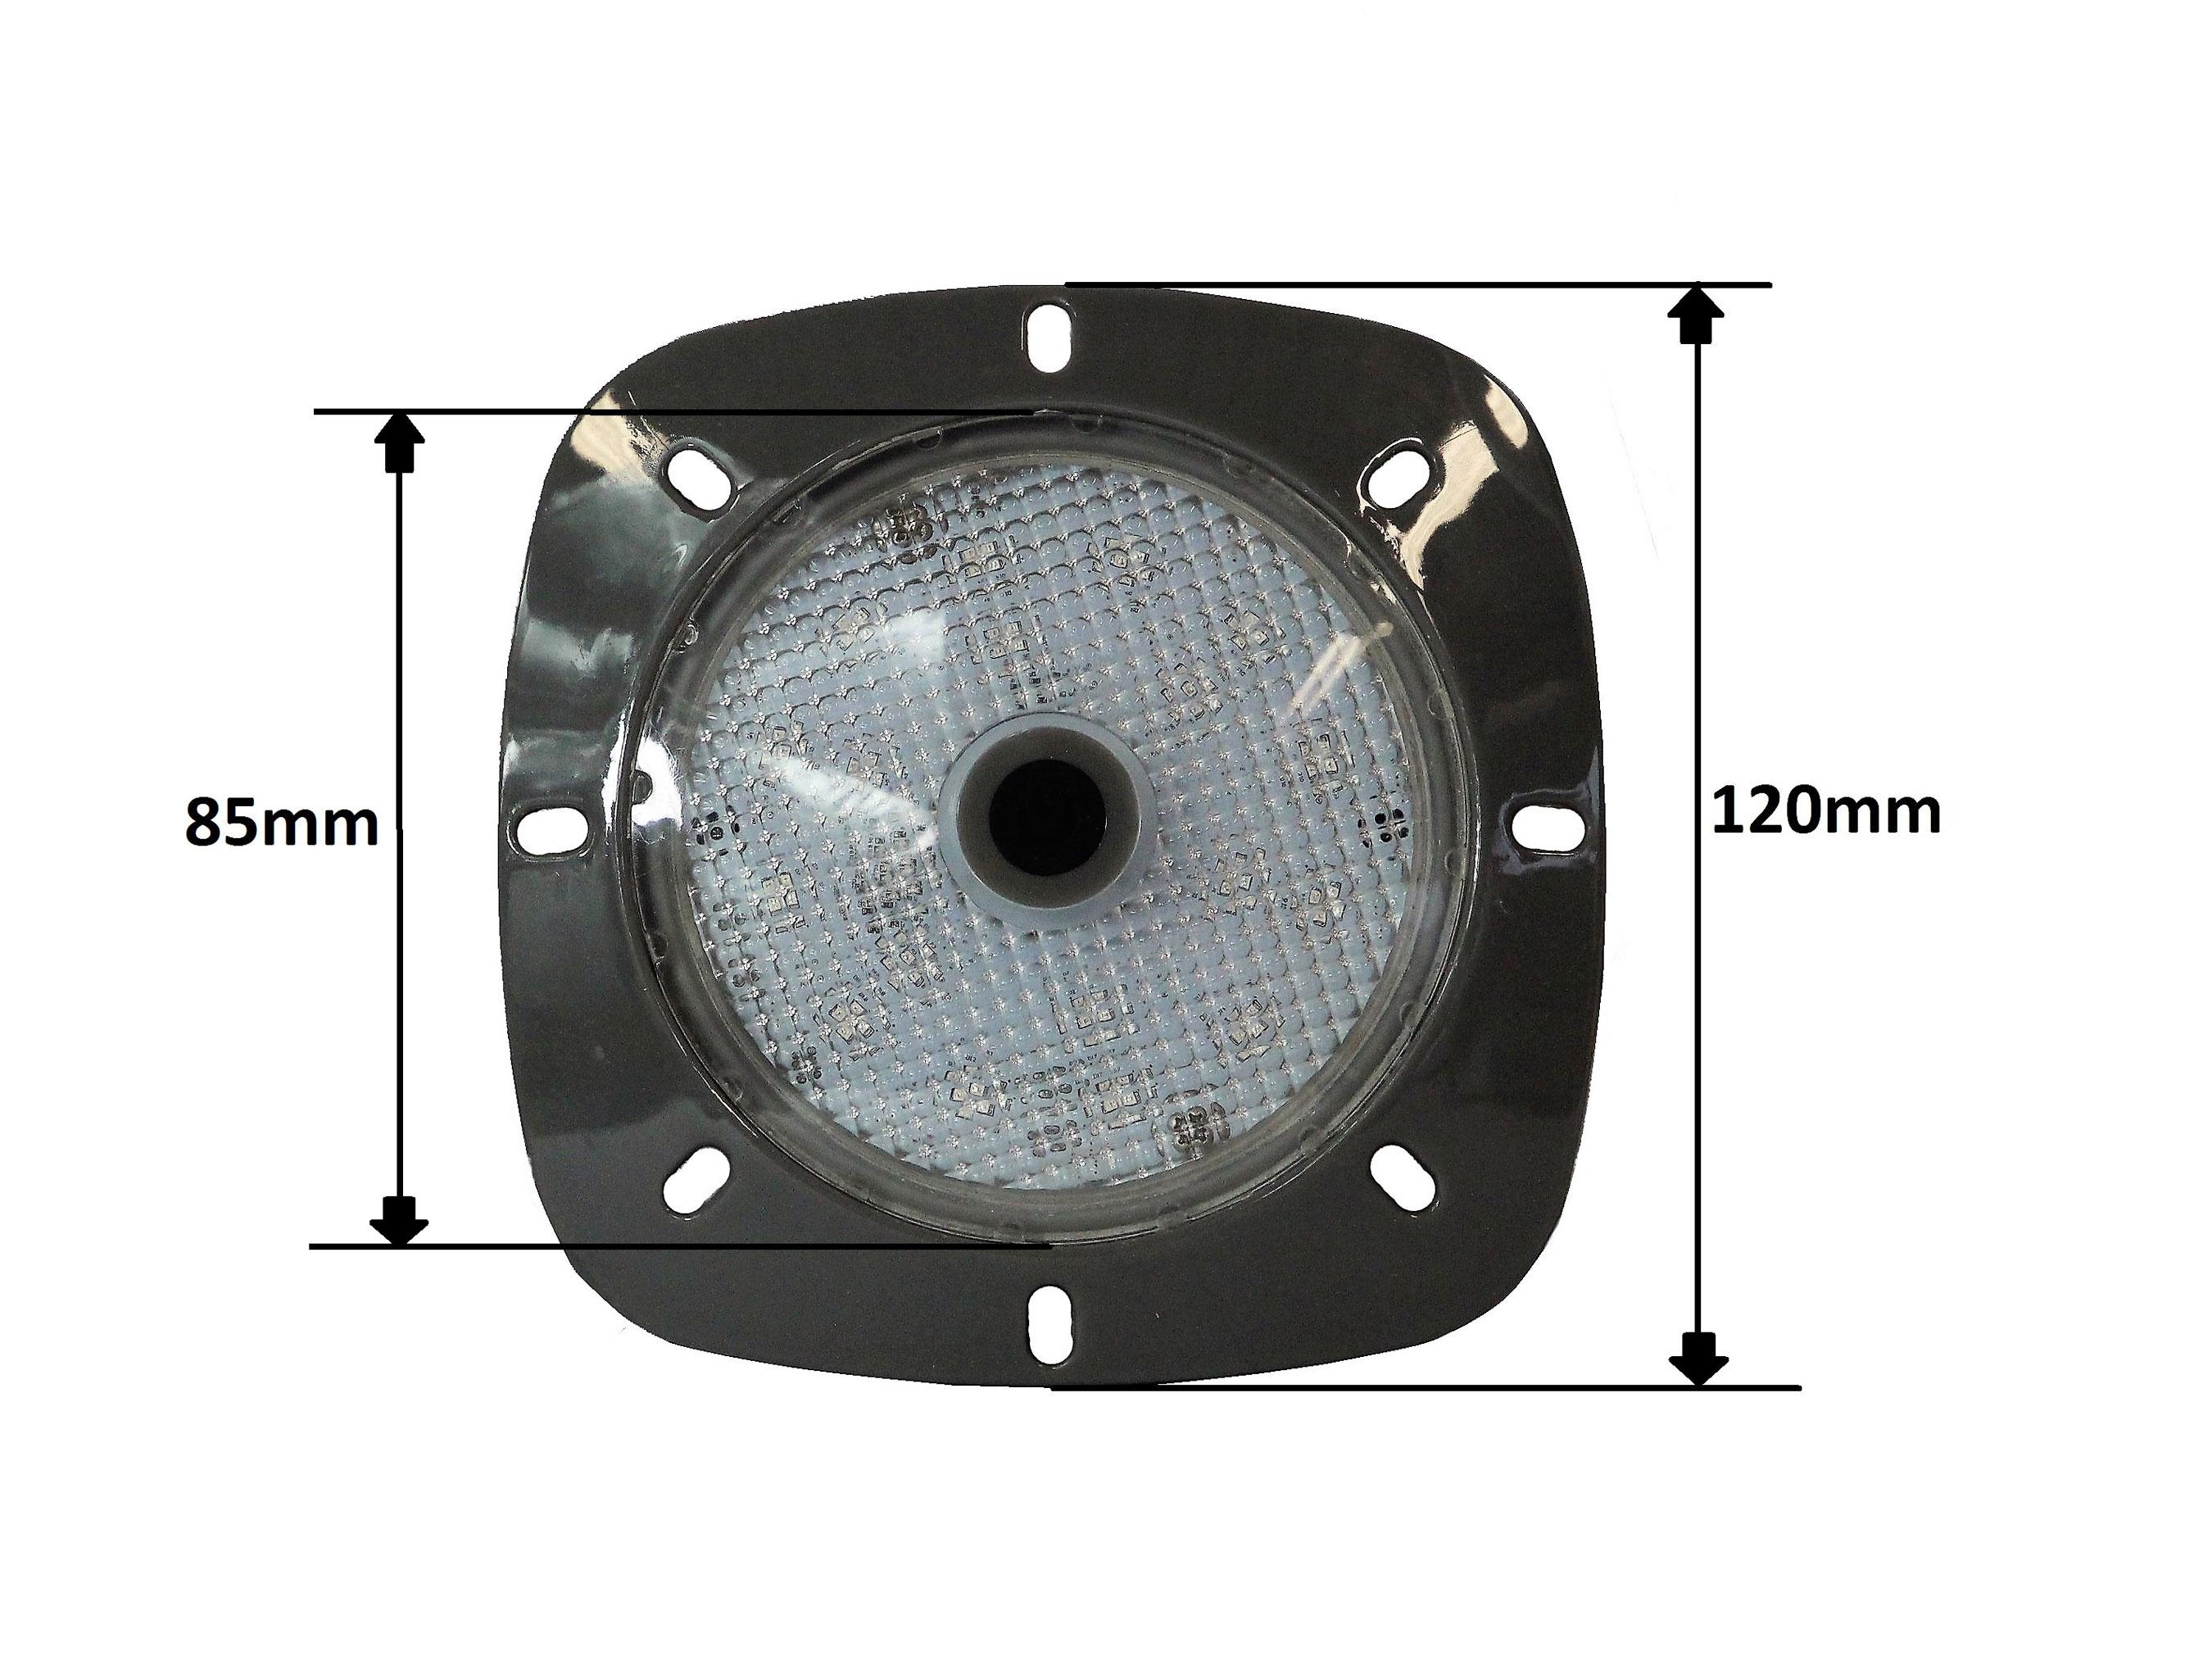 Poolbeleuchtung LED myPool LED-Magnet-Scheinwerfer grau/RGB Bild 2